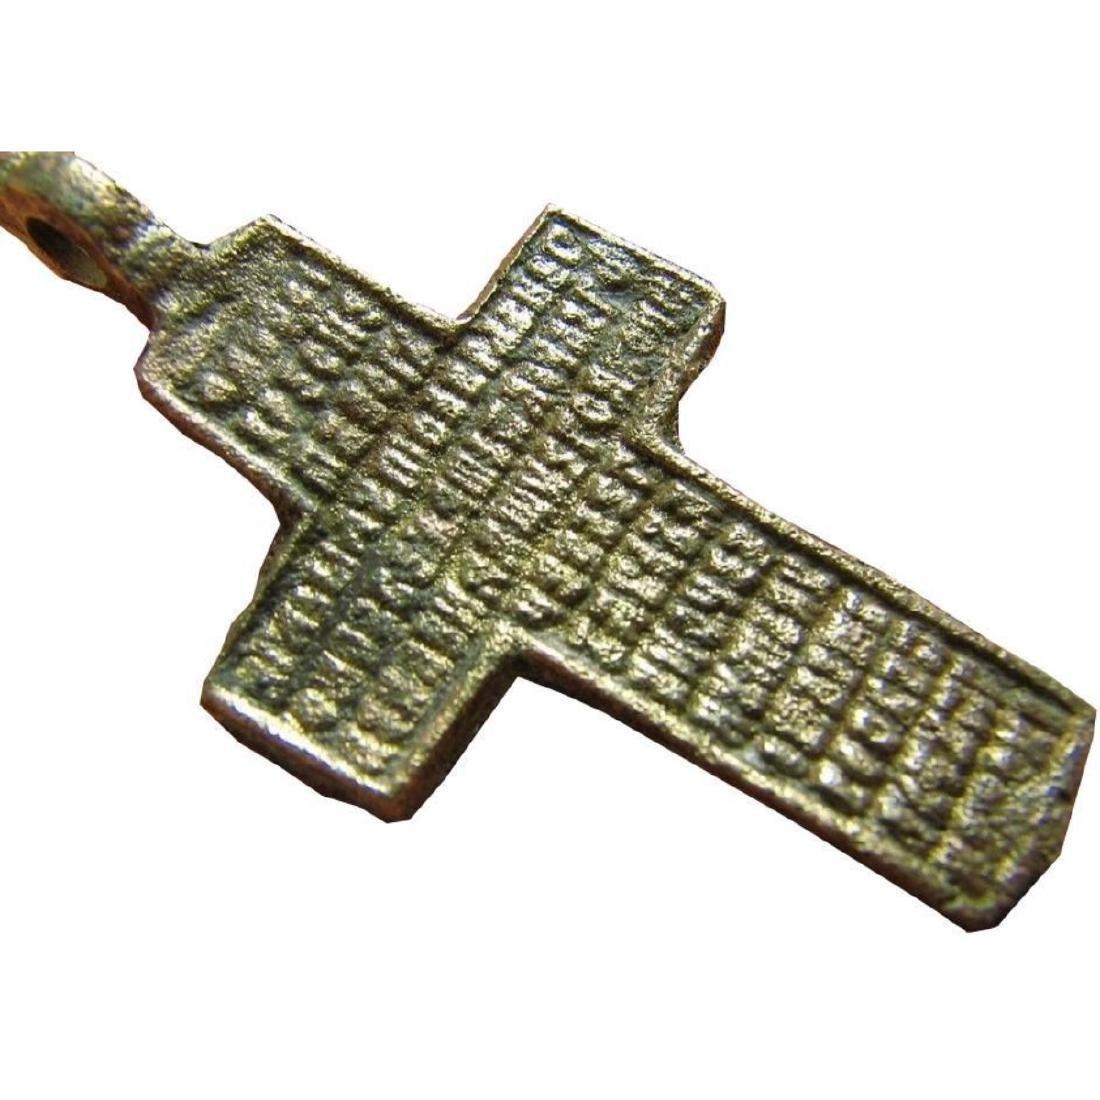 Rare Prayer Relief Big Late Medieval Orthodox Bronze - 7